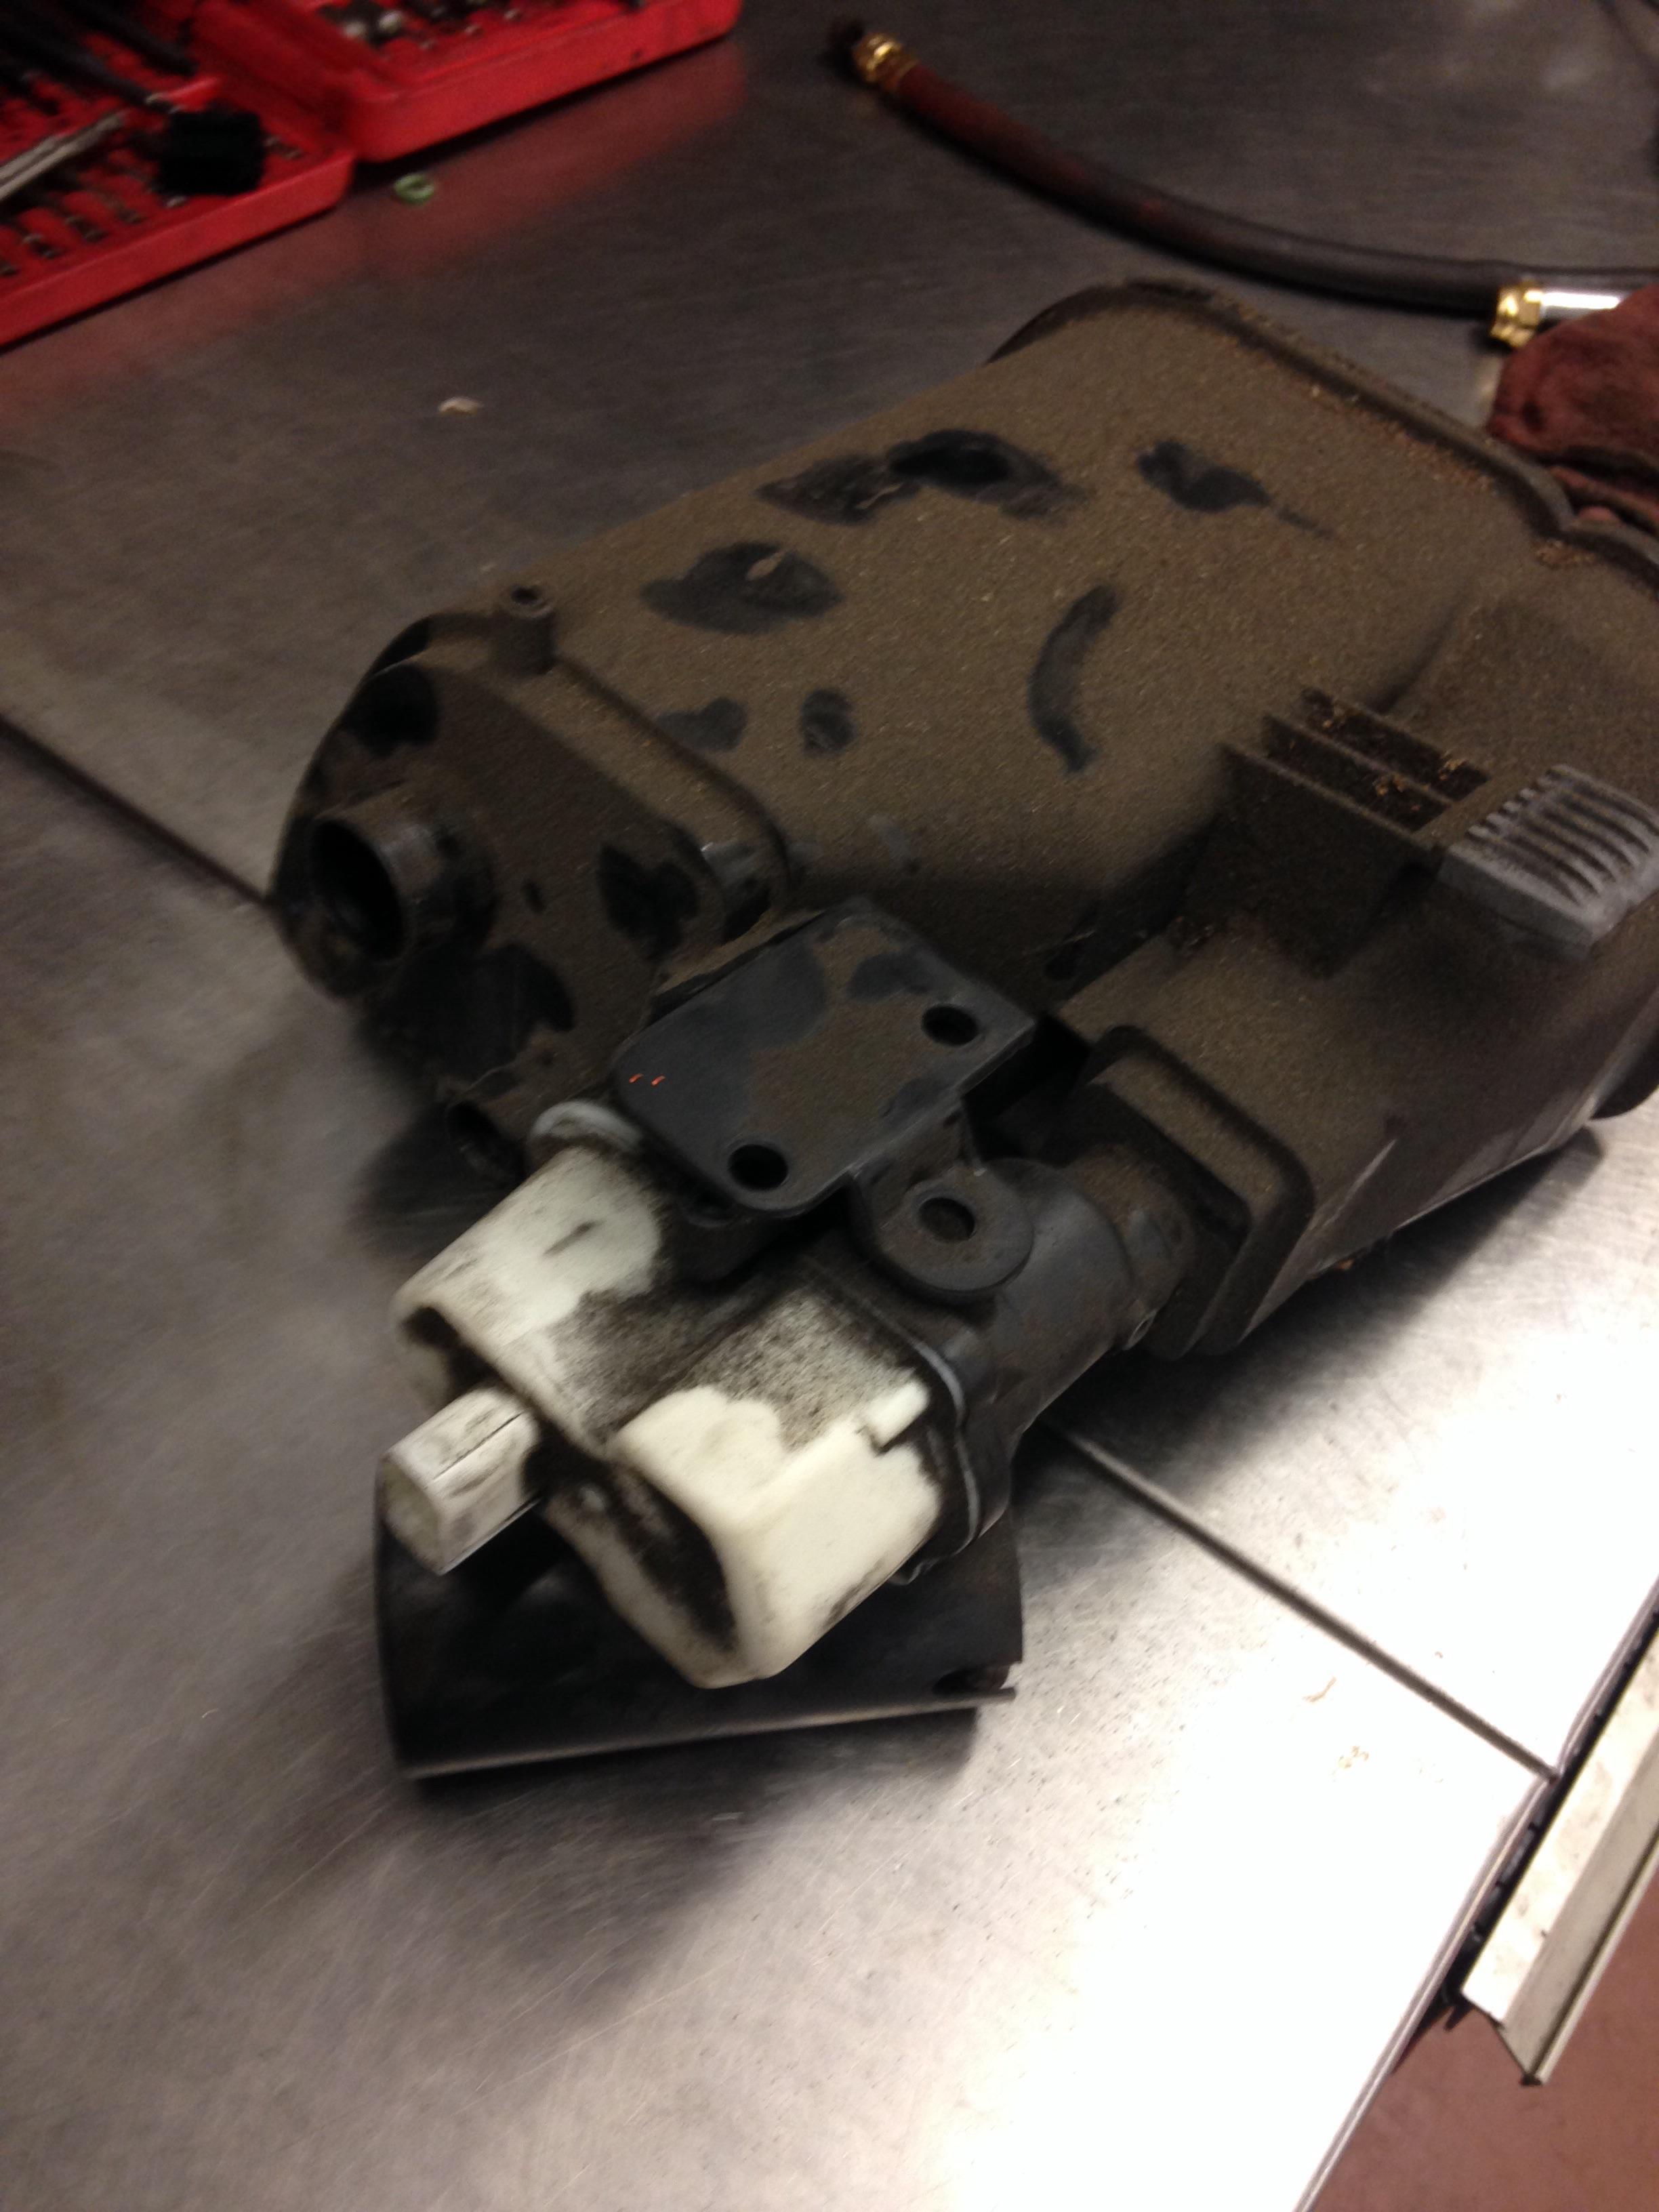 F10 DMTL pump and dust filter   bmwtechnician